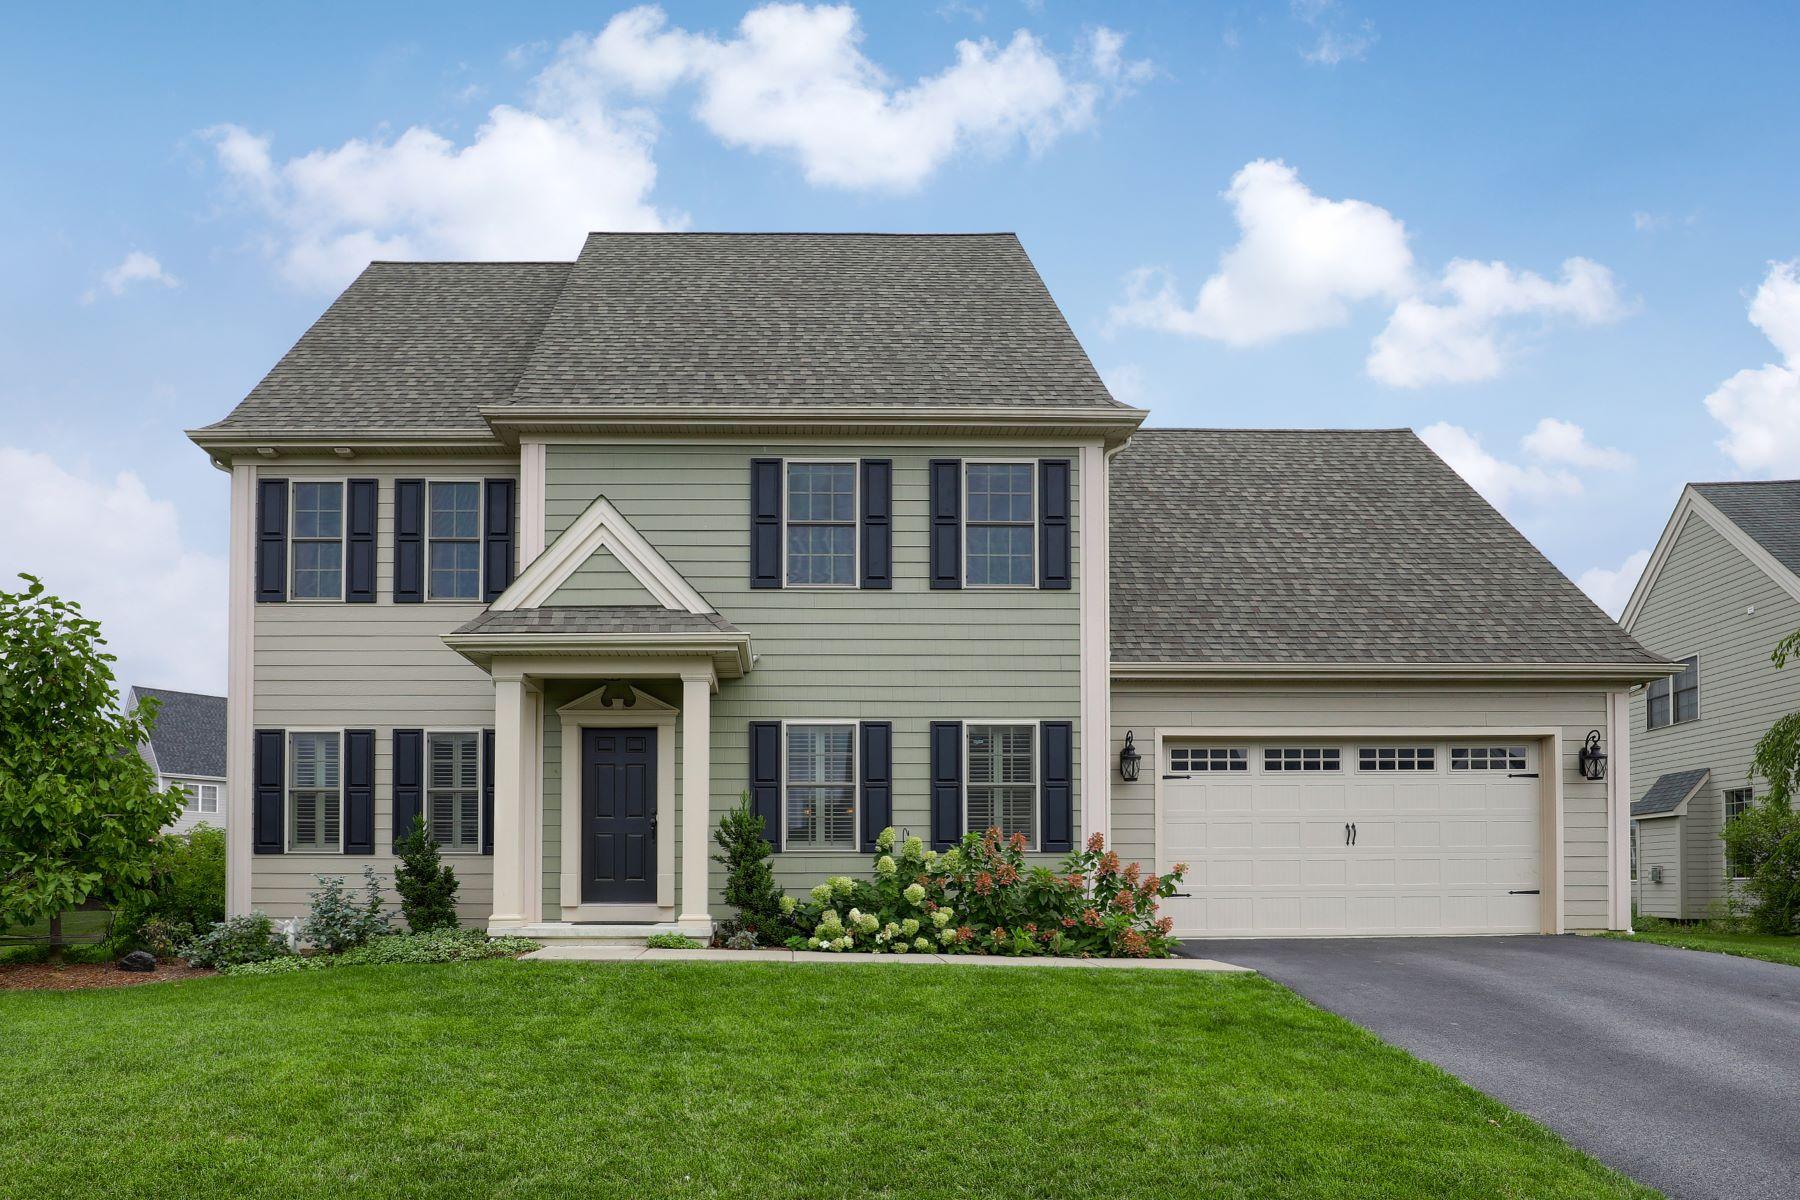 Single Family Homes for Sale at 683 Warminster Lane 683 Warminster Ln Lititz, Pennsylvania 17543 United States